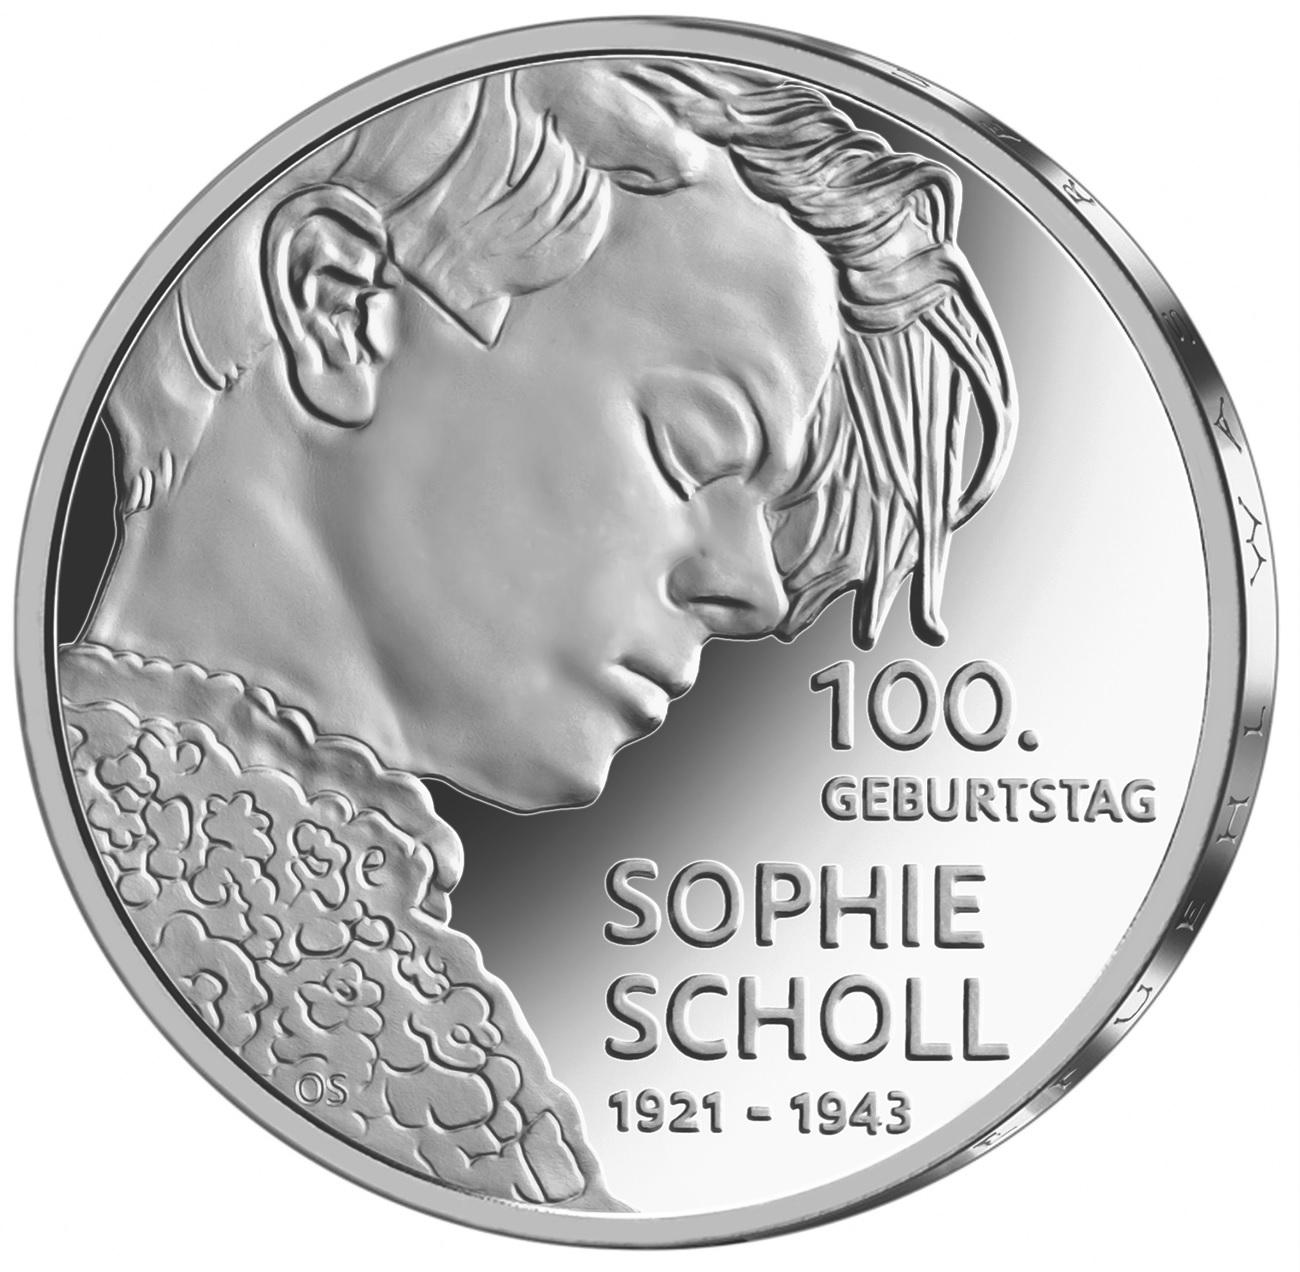 Германия монета 20 евро Софи Шолль, реверс